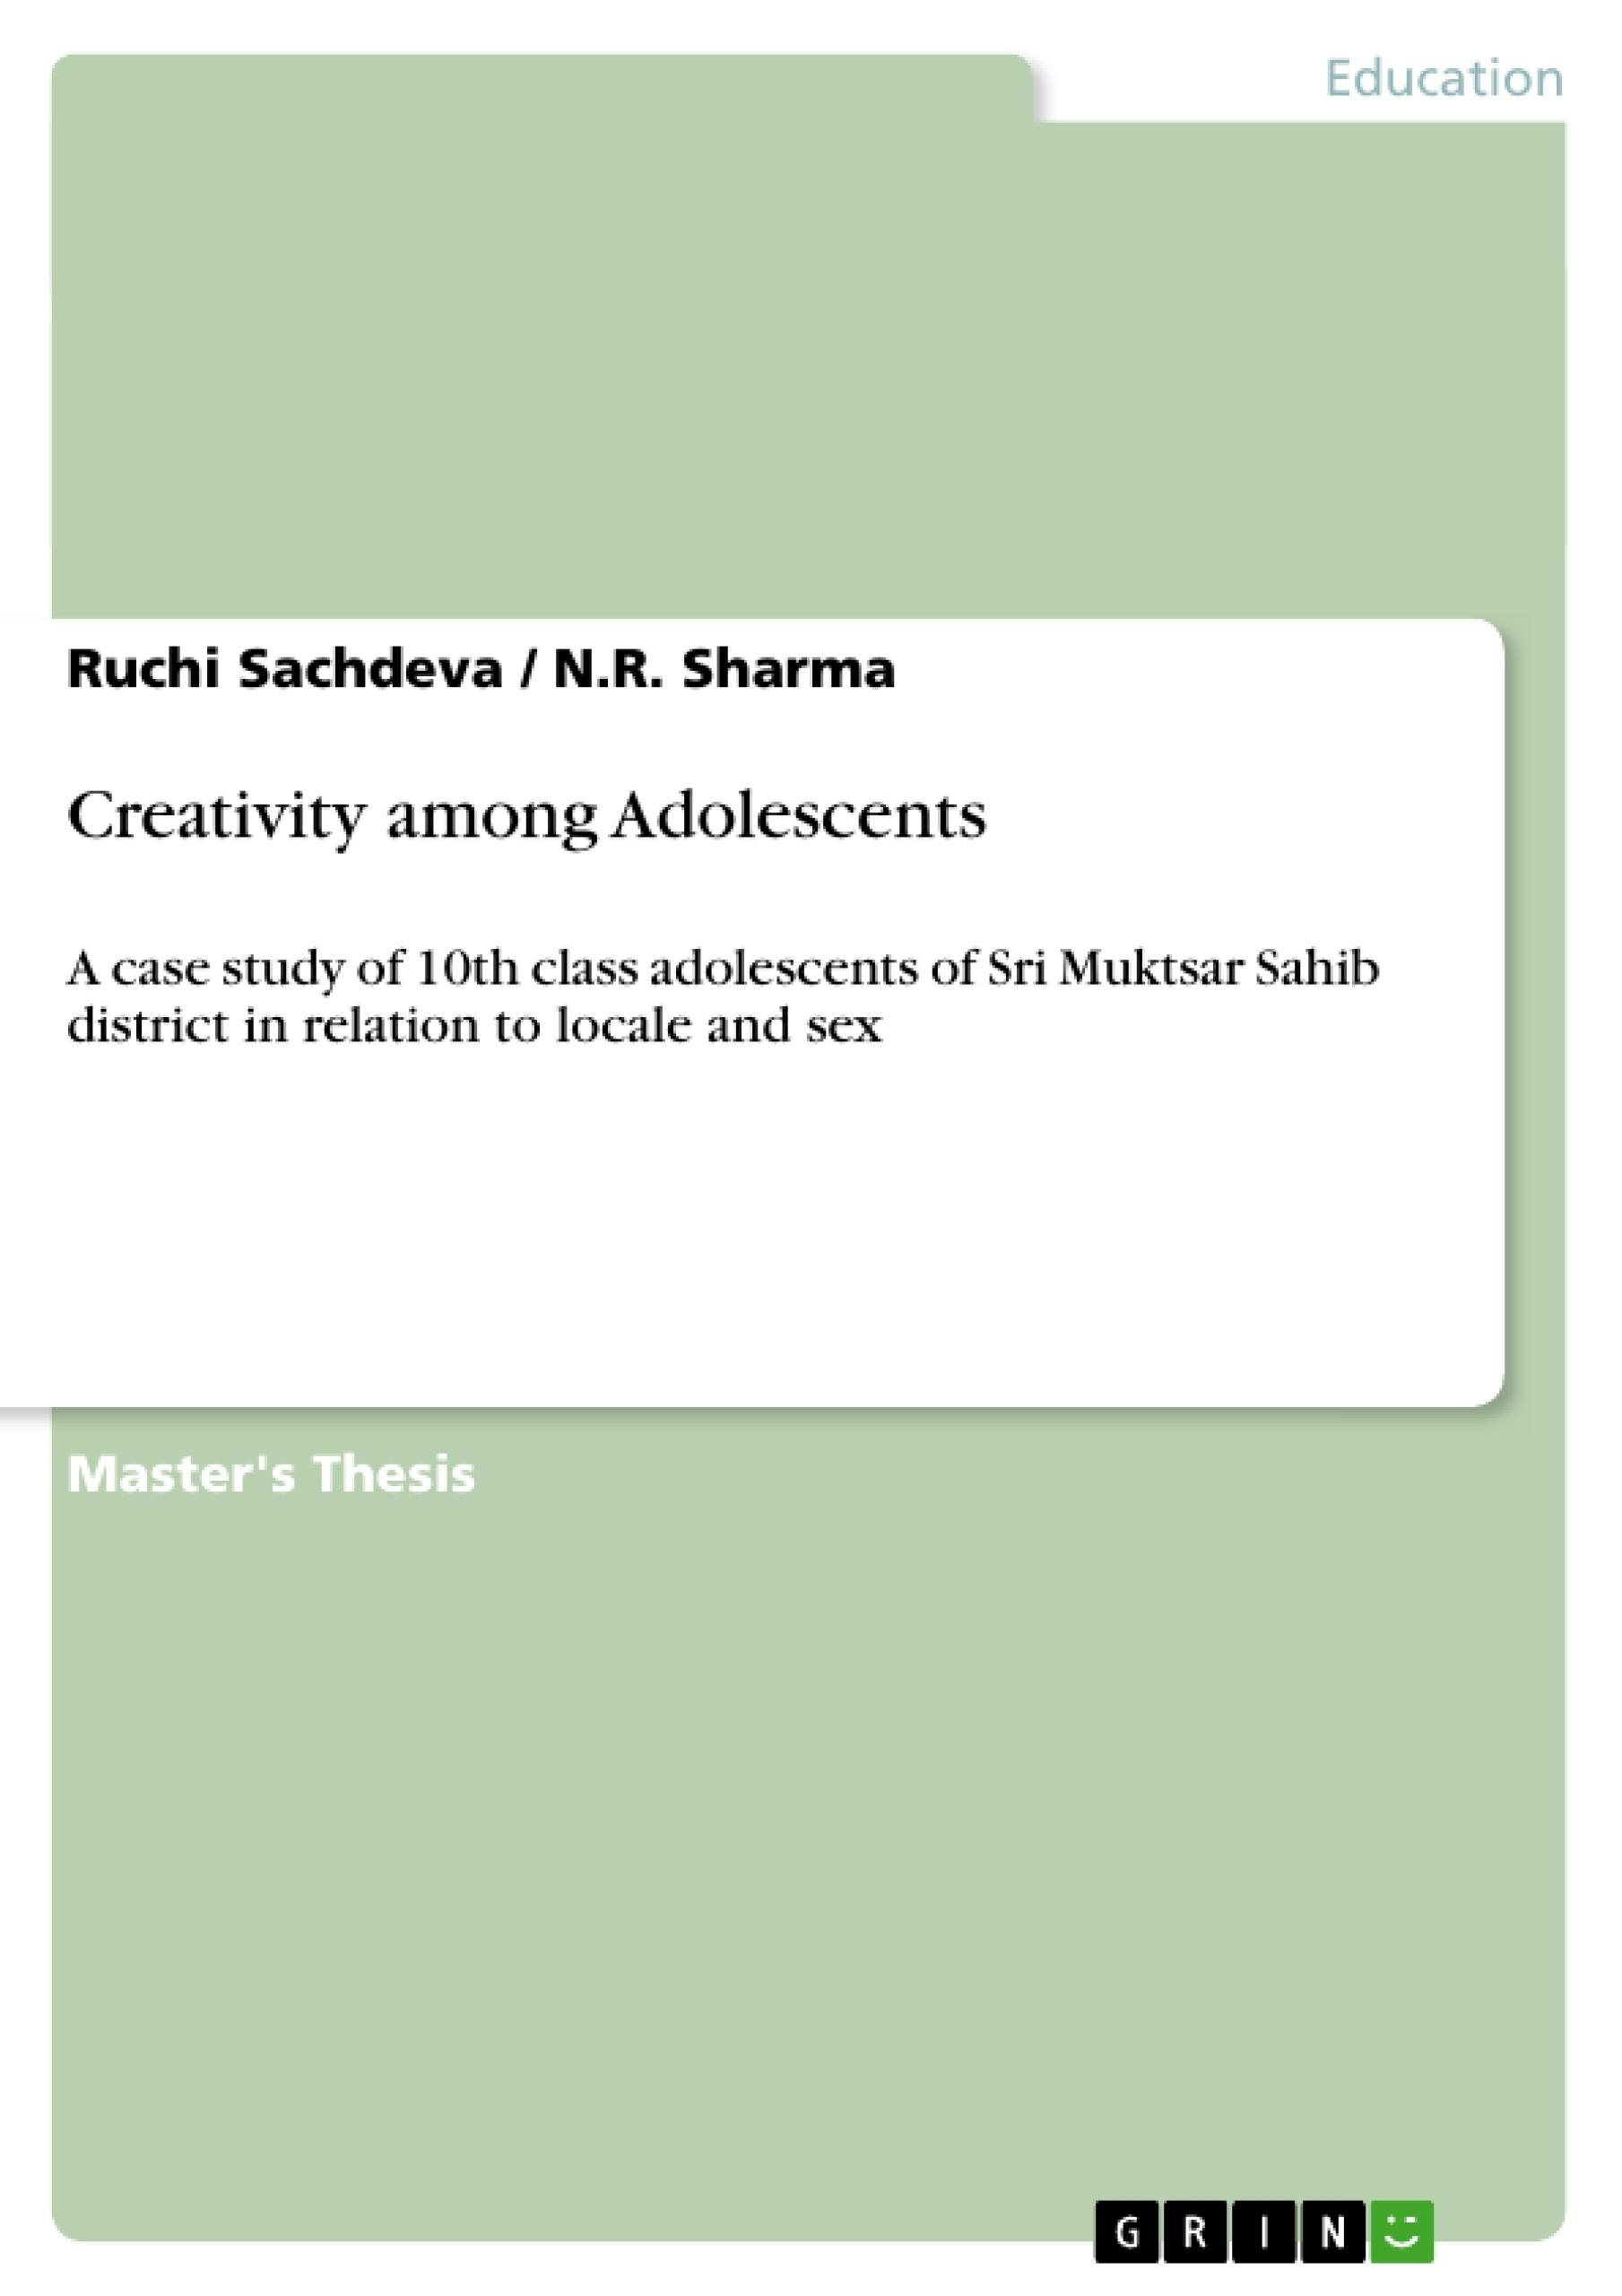 Title: Creativity among Adolescents